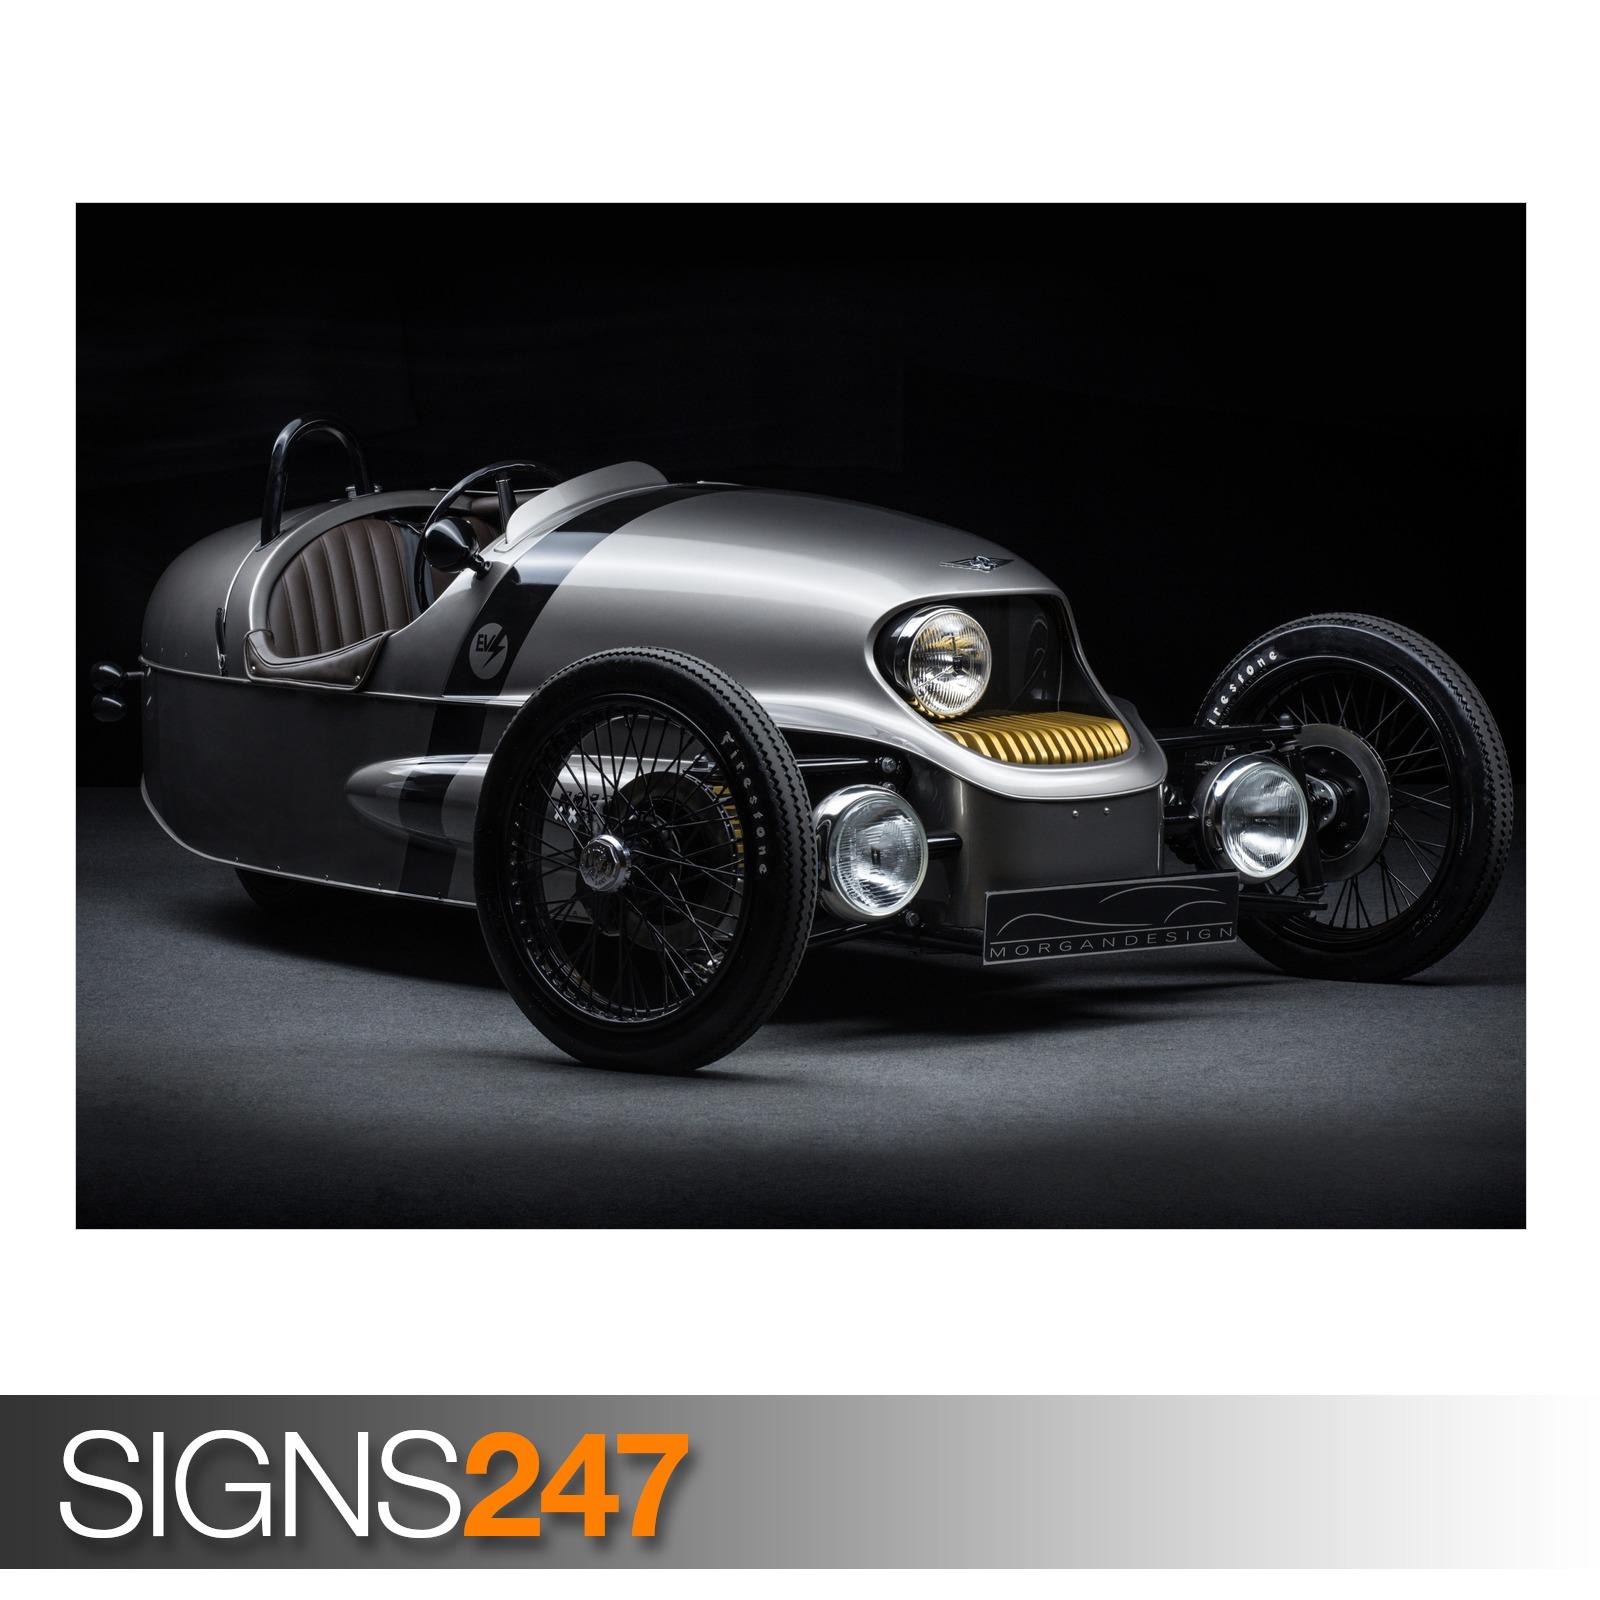 MORGAN-THREE-WHEELER-EV3-AD747-CAR-POSTER-Photo-Poster-Print-Art-All-Sizes